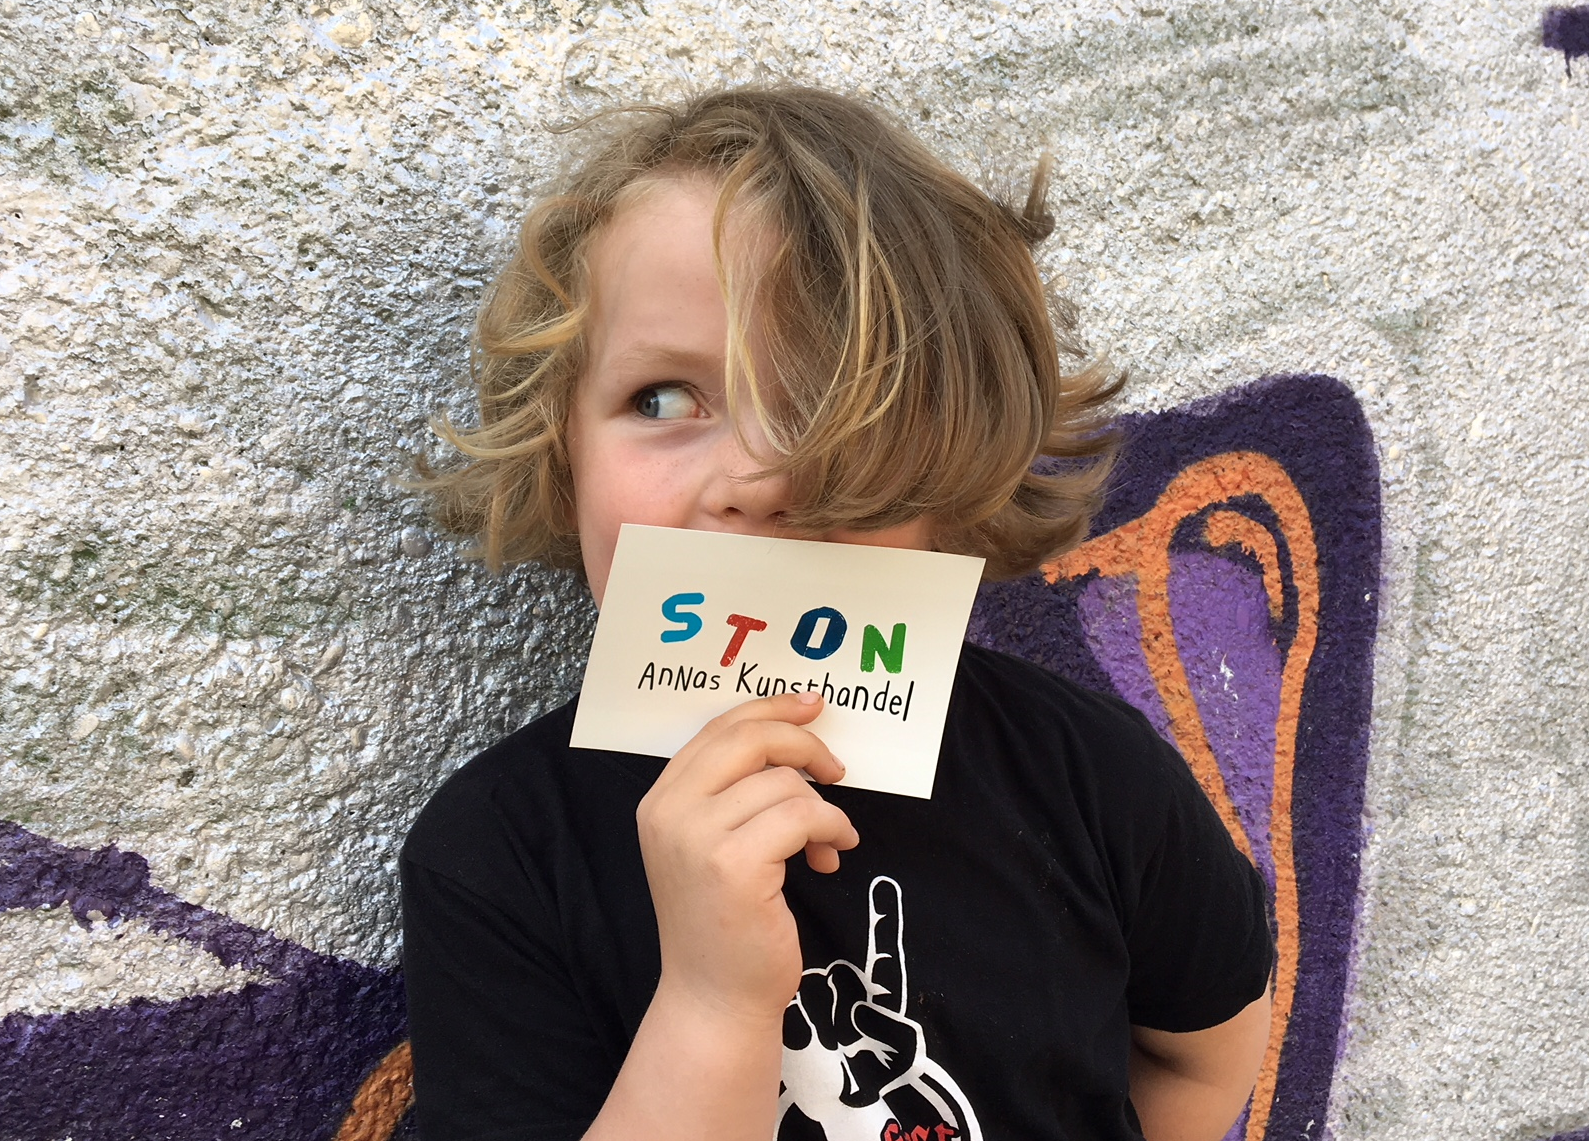 fünfjhährige Unternehmerin